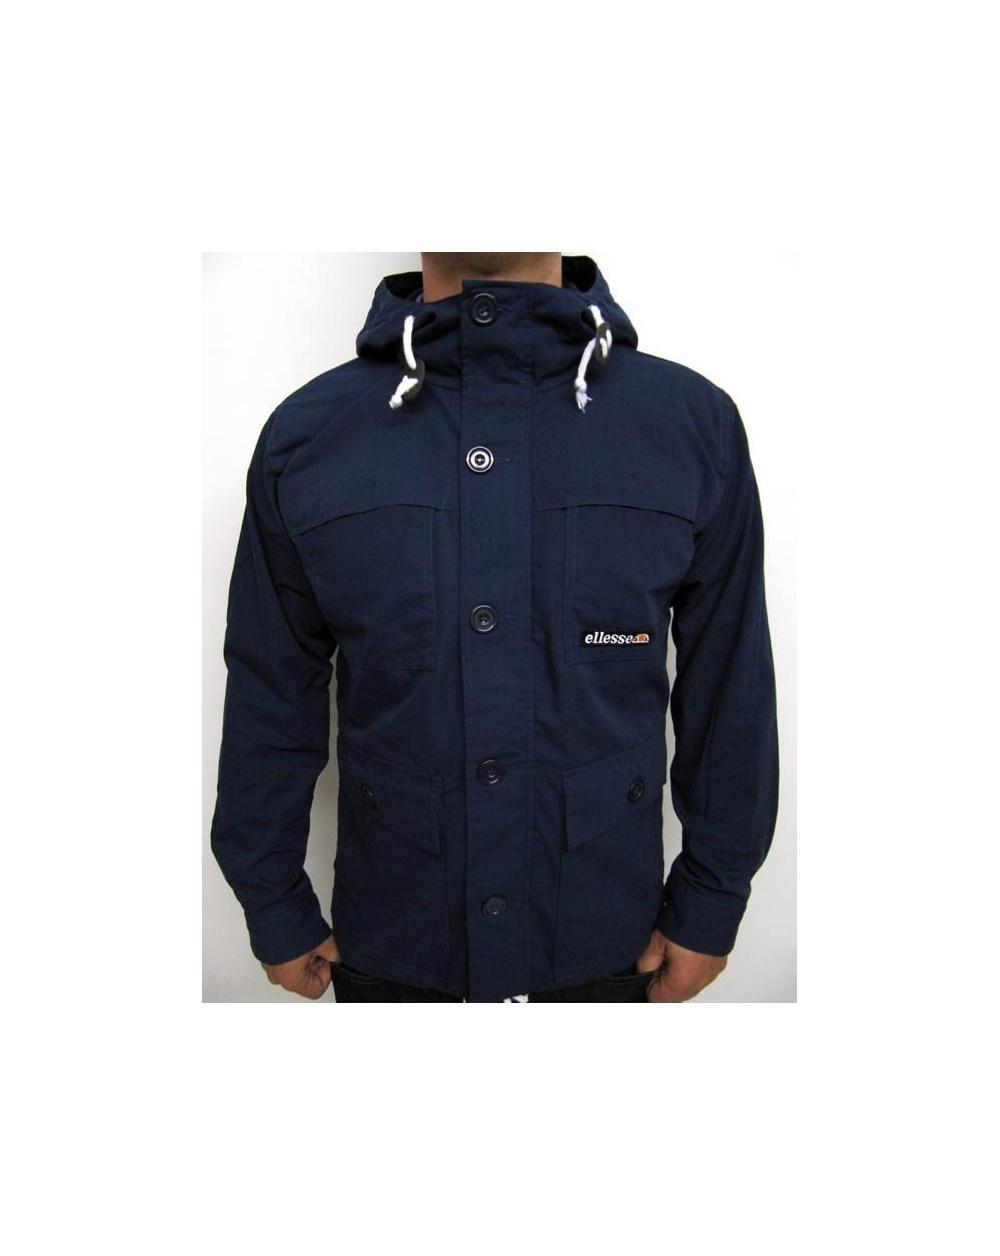 ellesse rallidae jacket navy ellesse heritage rallidae coat. Black Bedroom Furniture Sets. Home Design Ideas